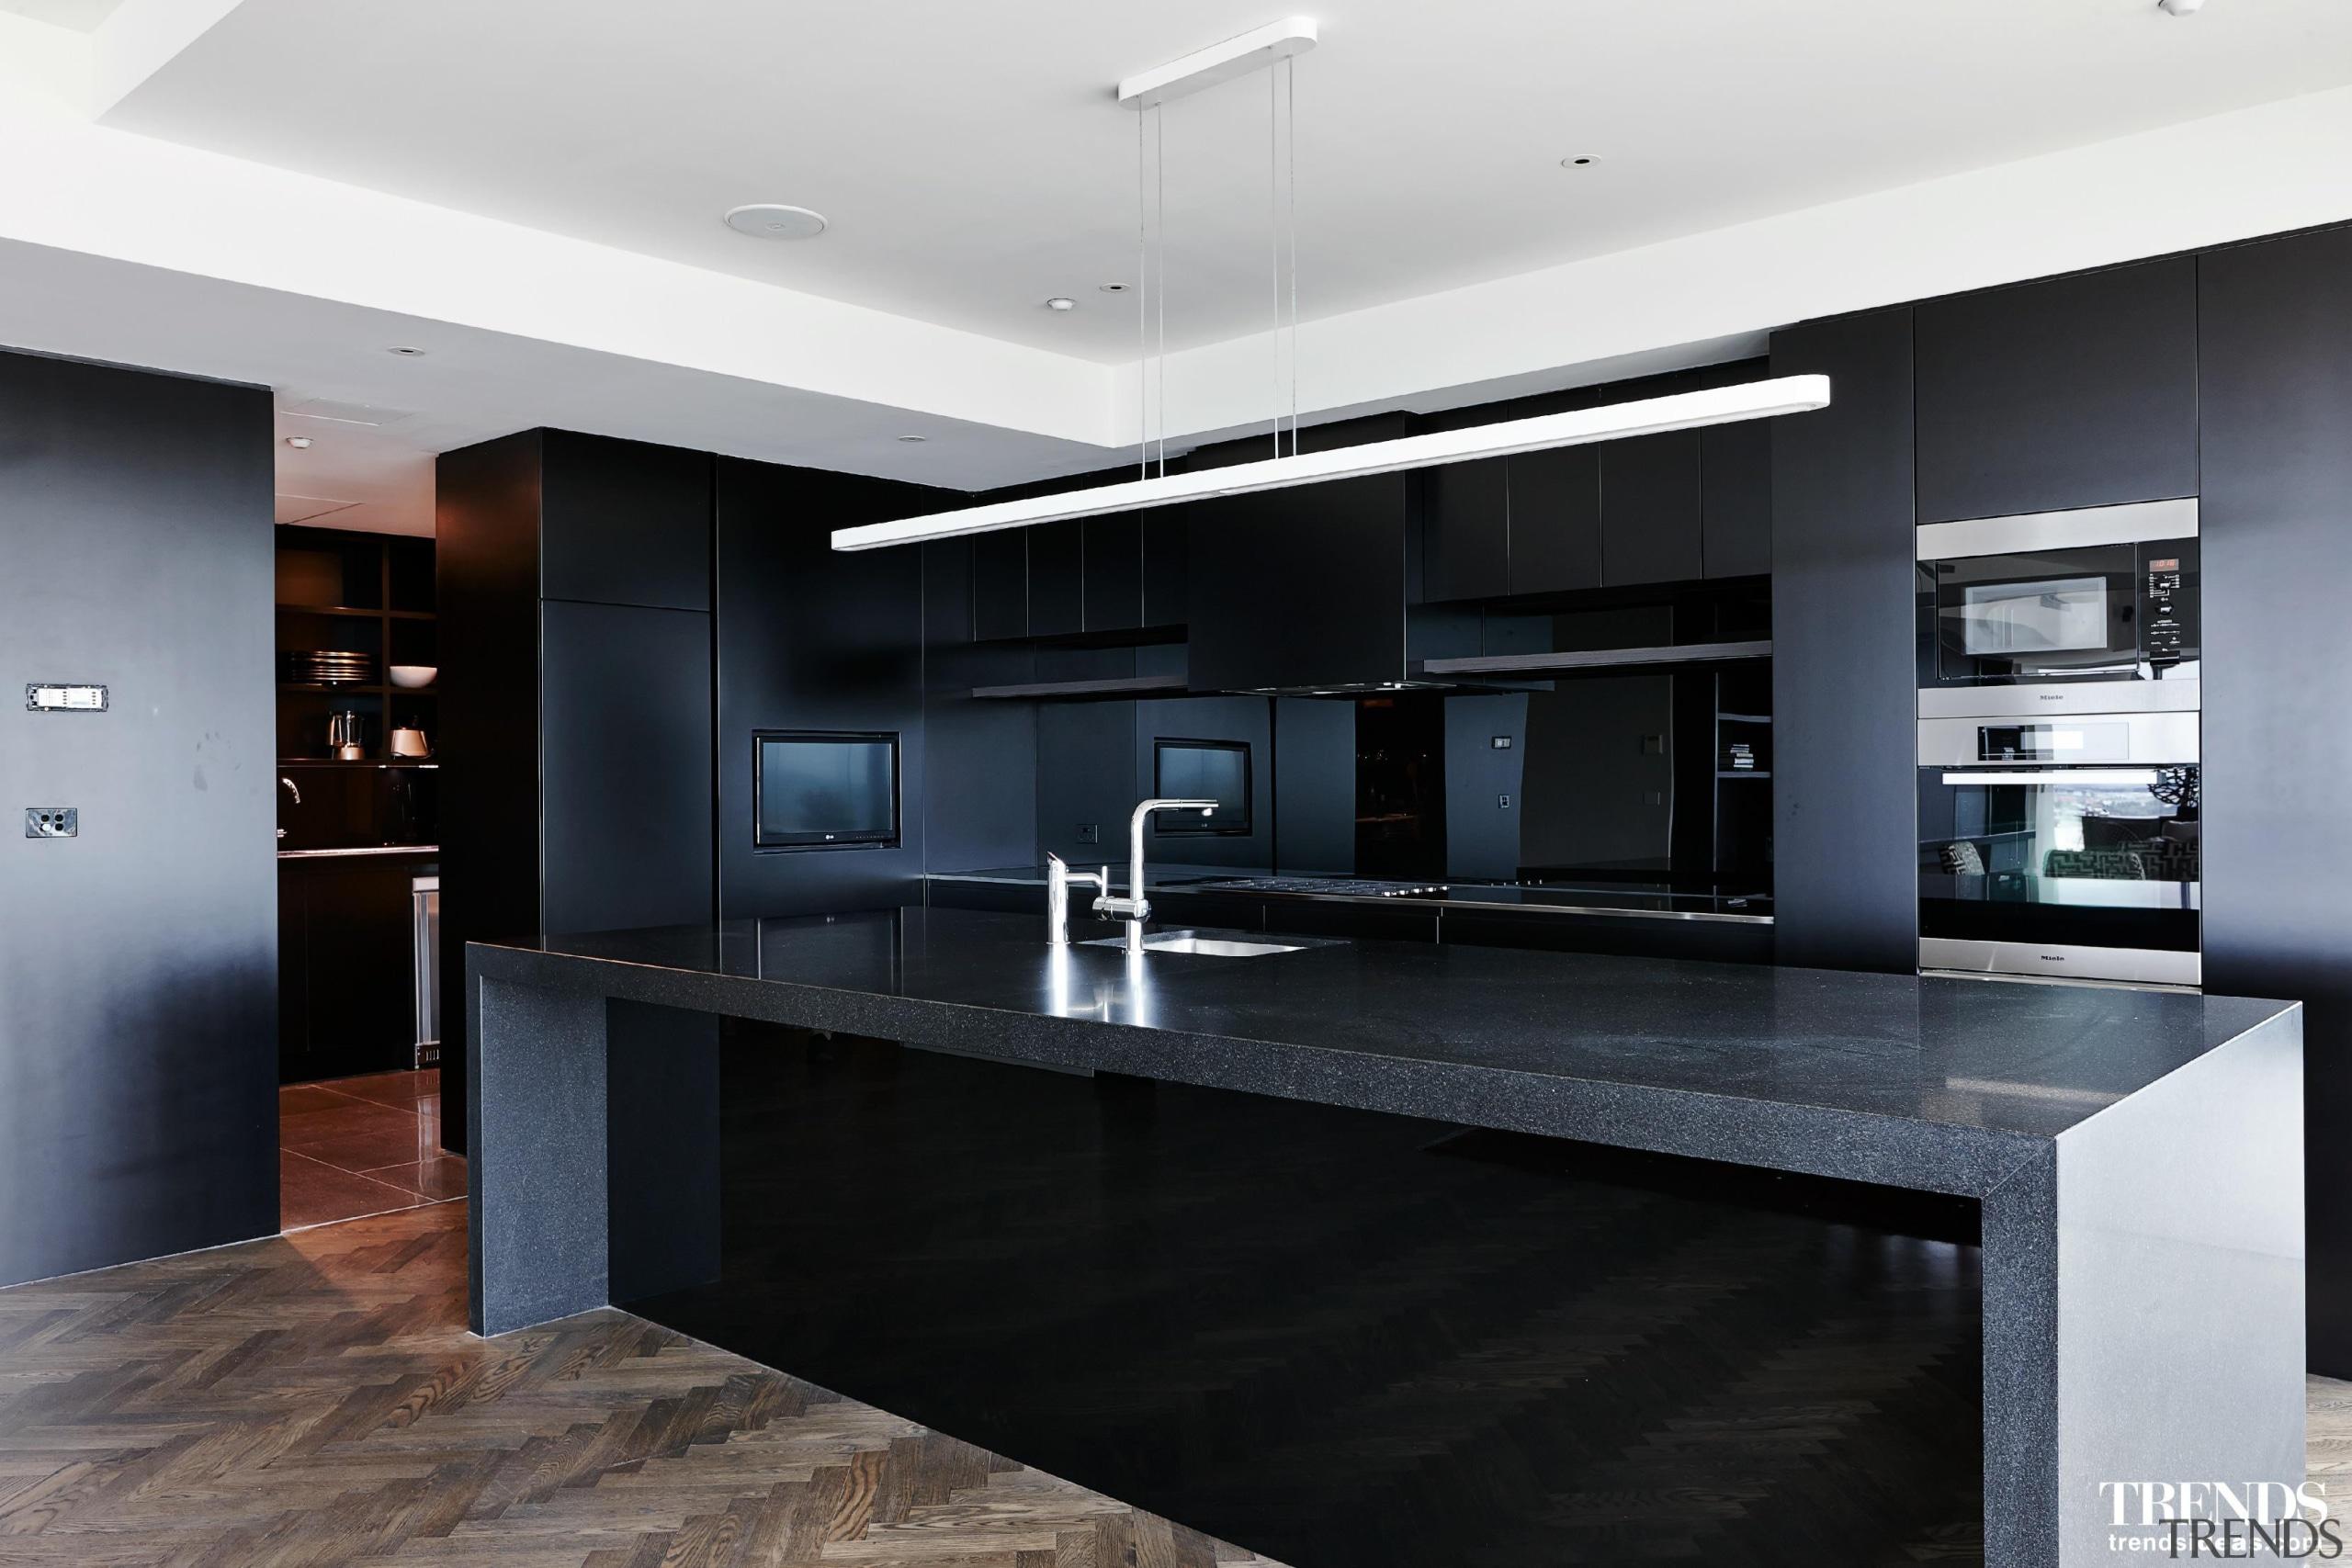 Daniel Ash Architects - cabinetry | countertop | cabinetry, countertop, cuisine classique, interior design, kitchen, real estate, black